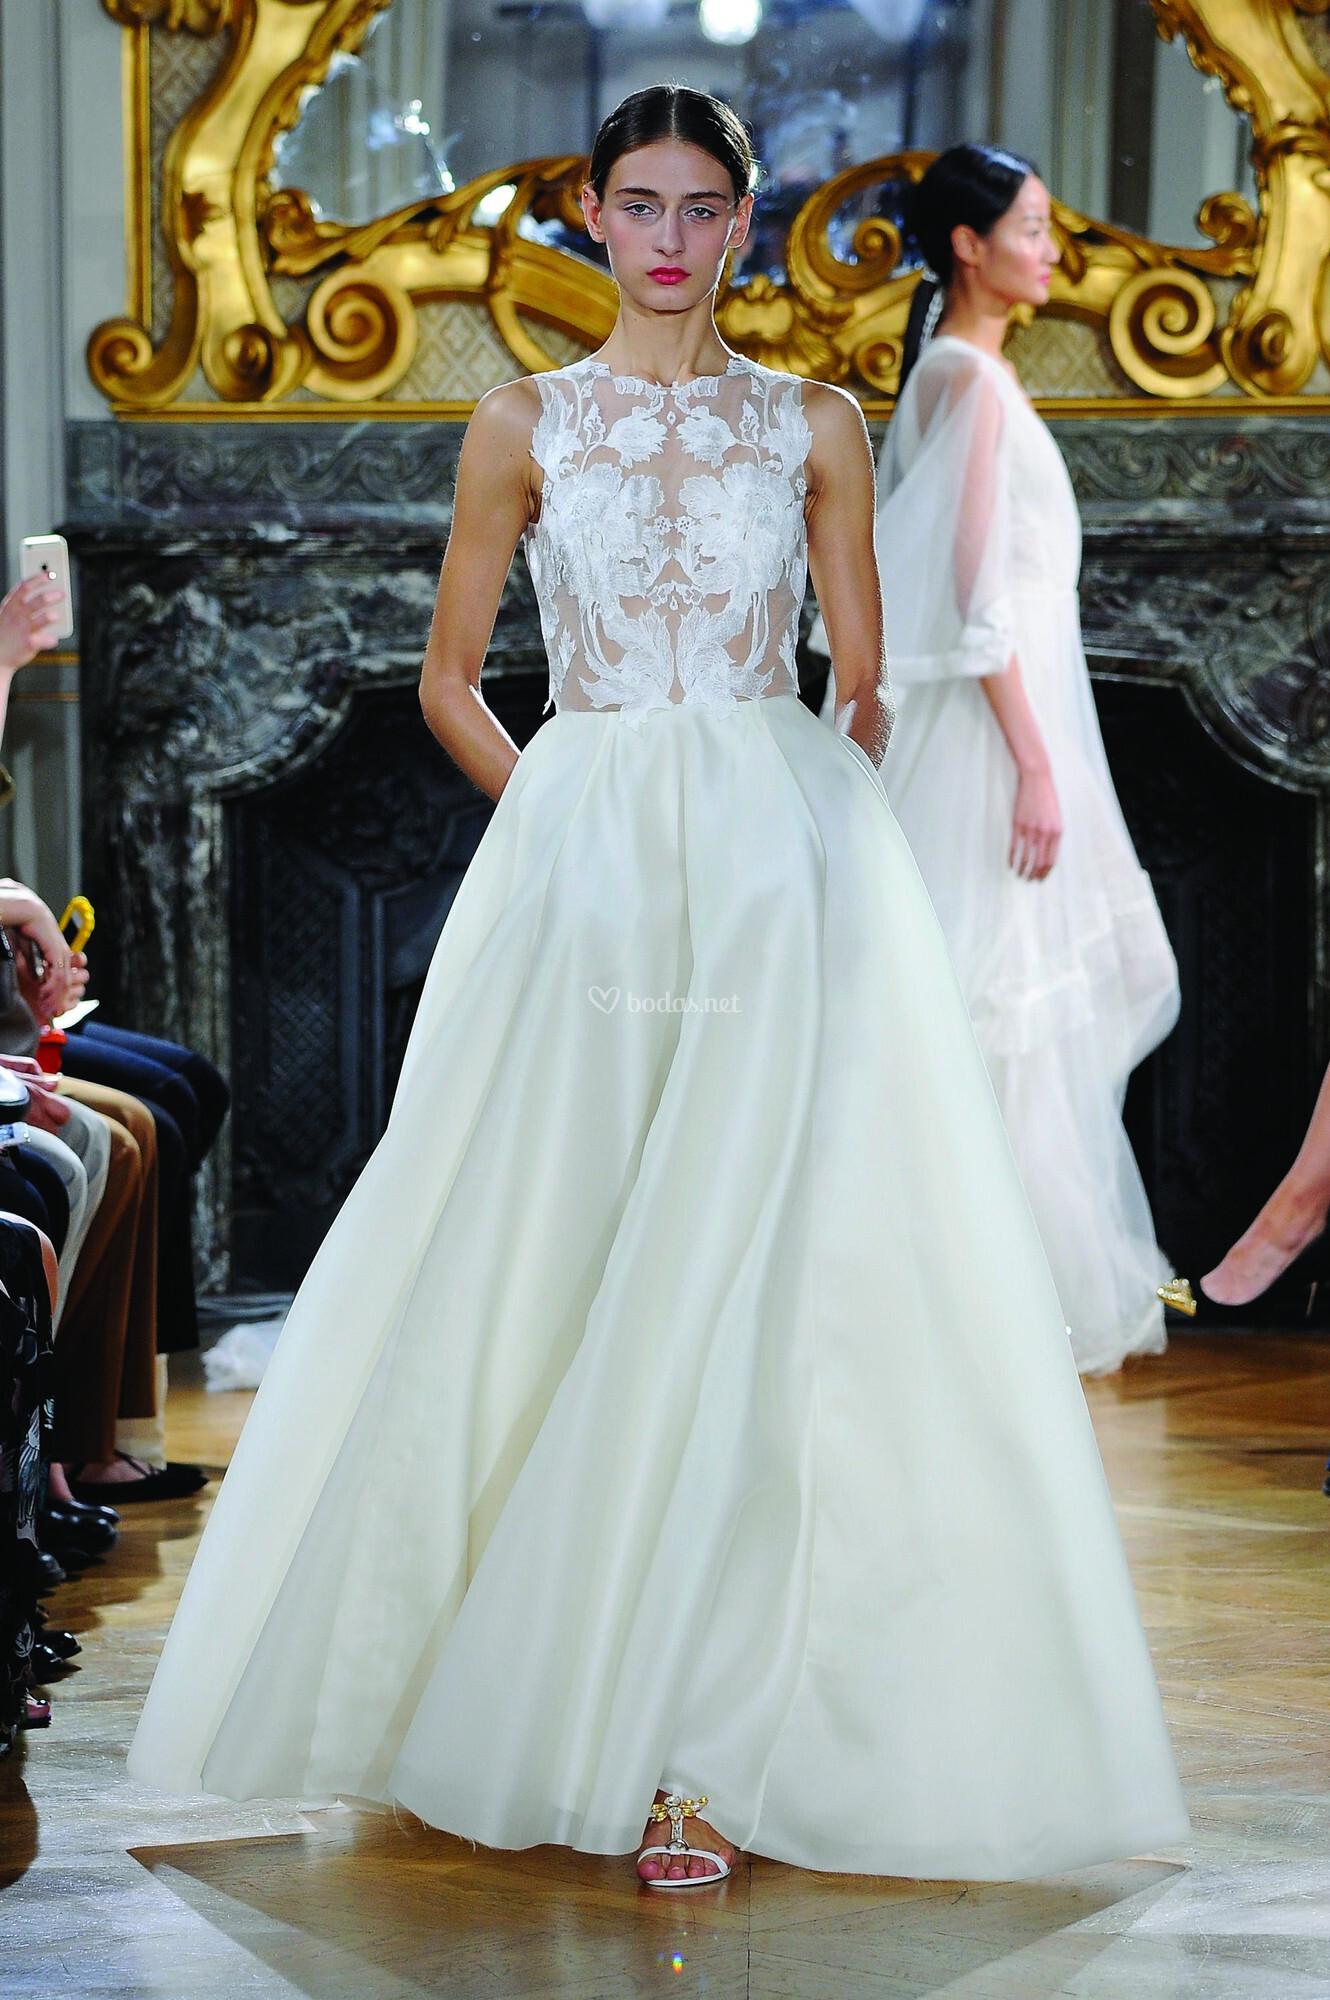 Colorful Vestido Novia Grace Kelly Photos - All Wedding Dresses ...